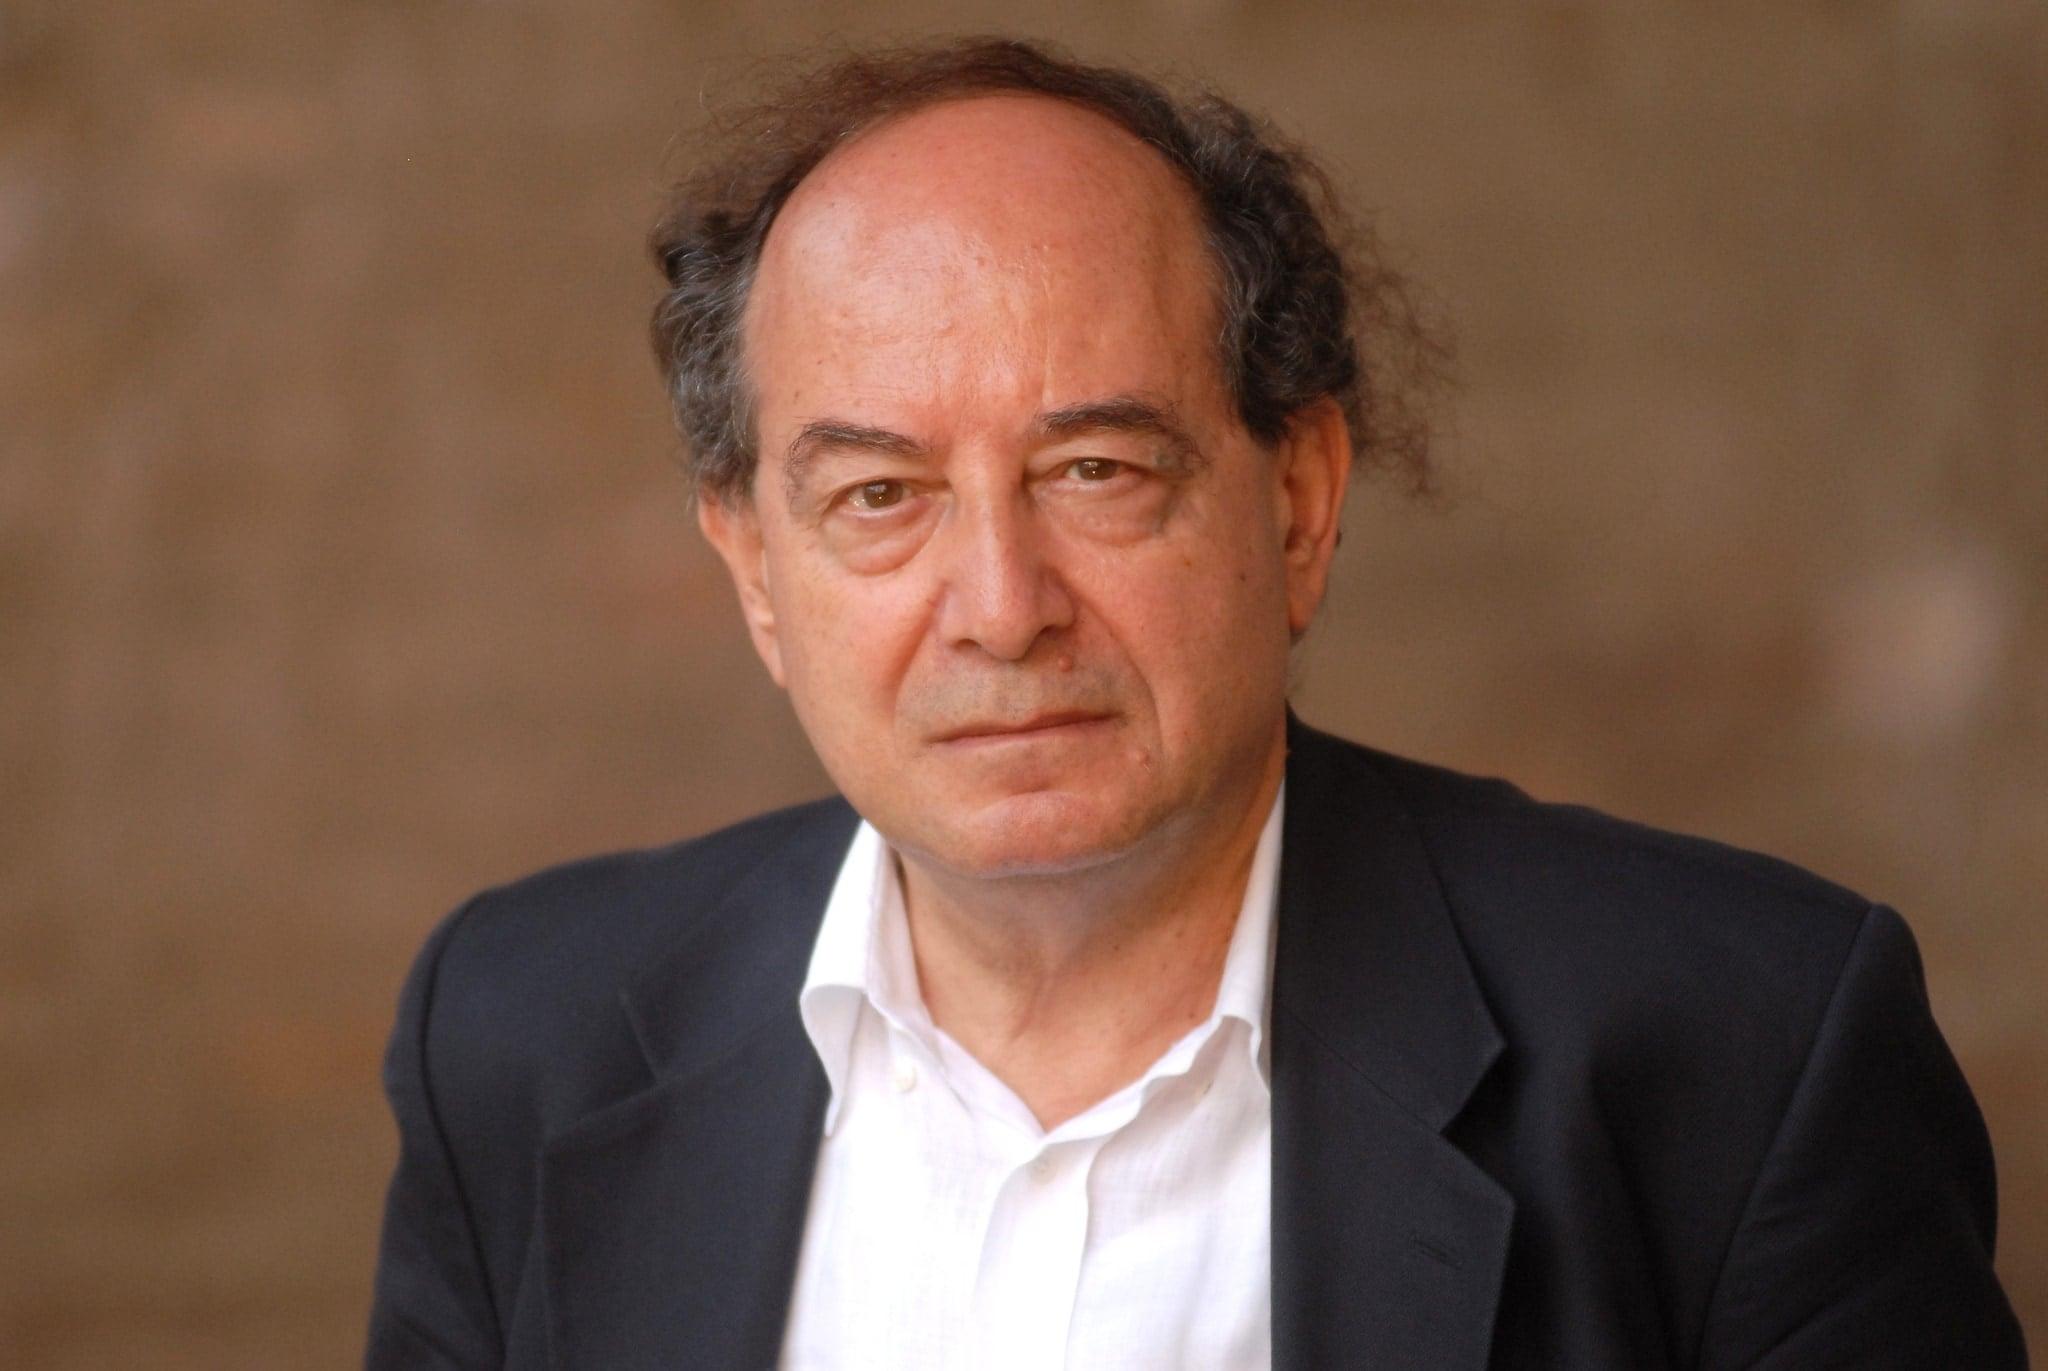 Morto Roberto Calasso